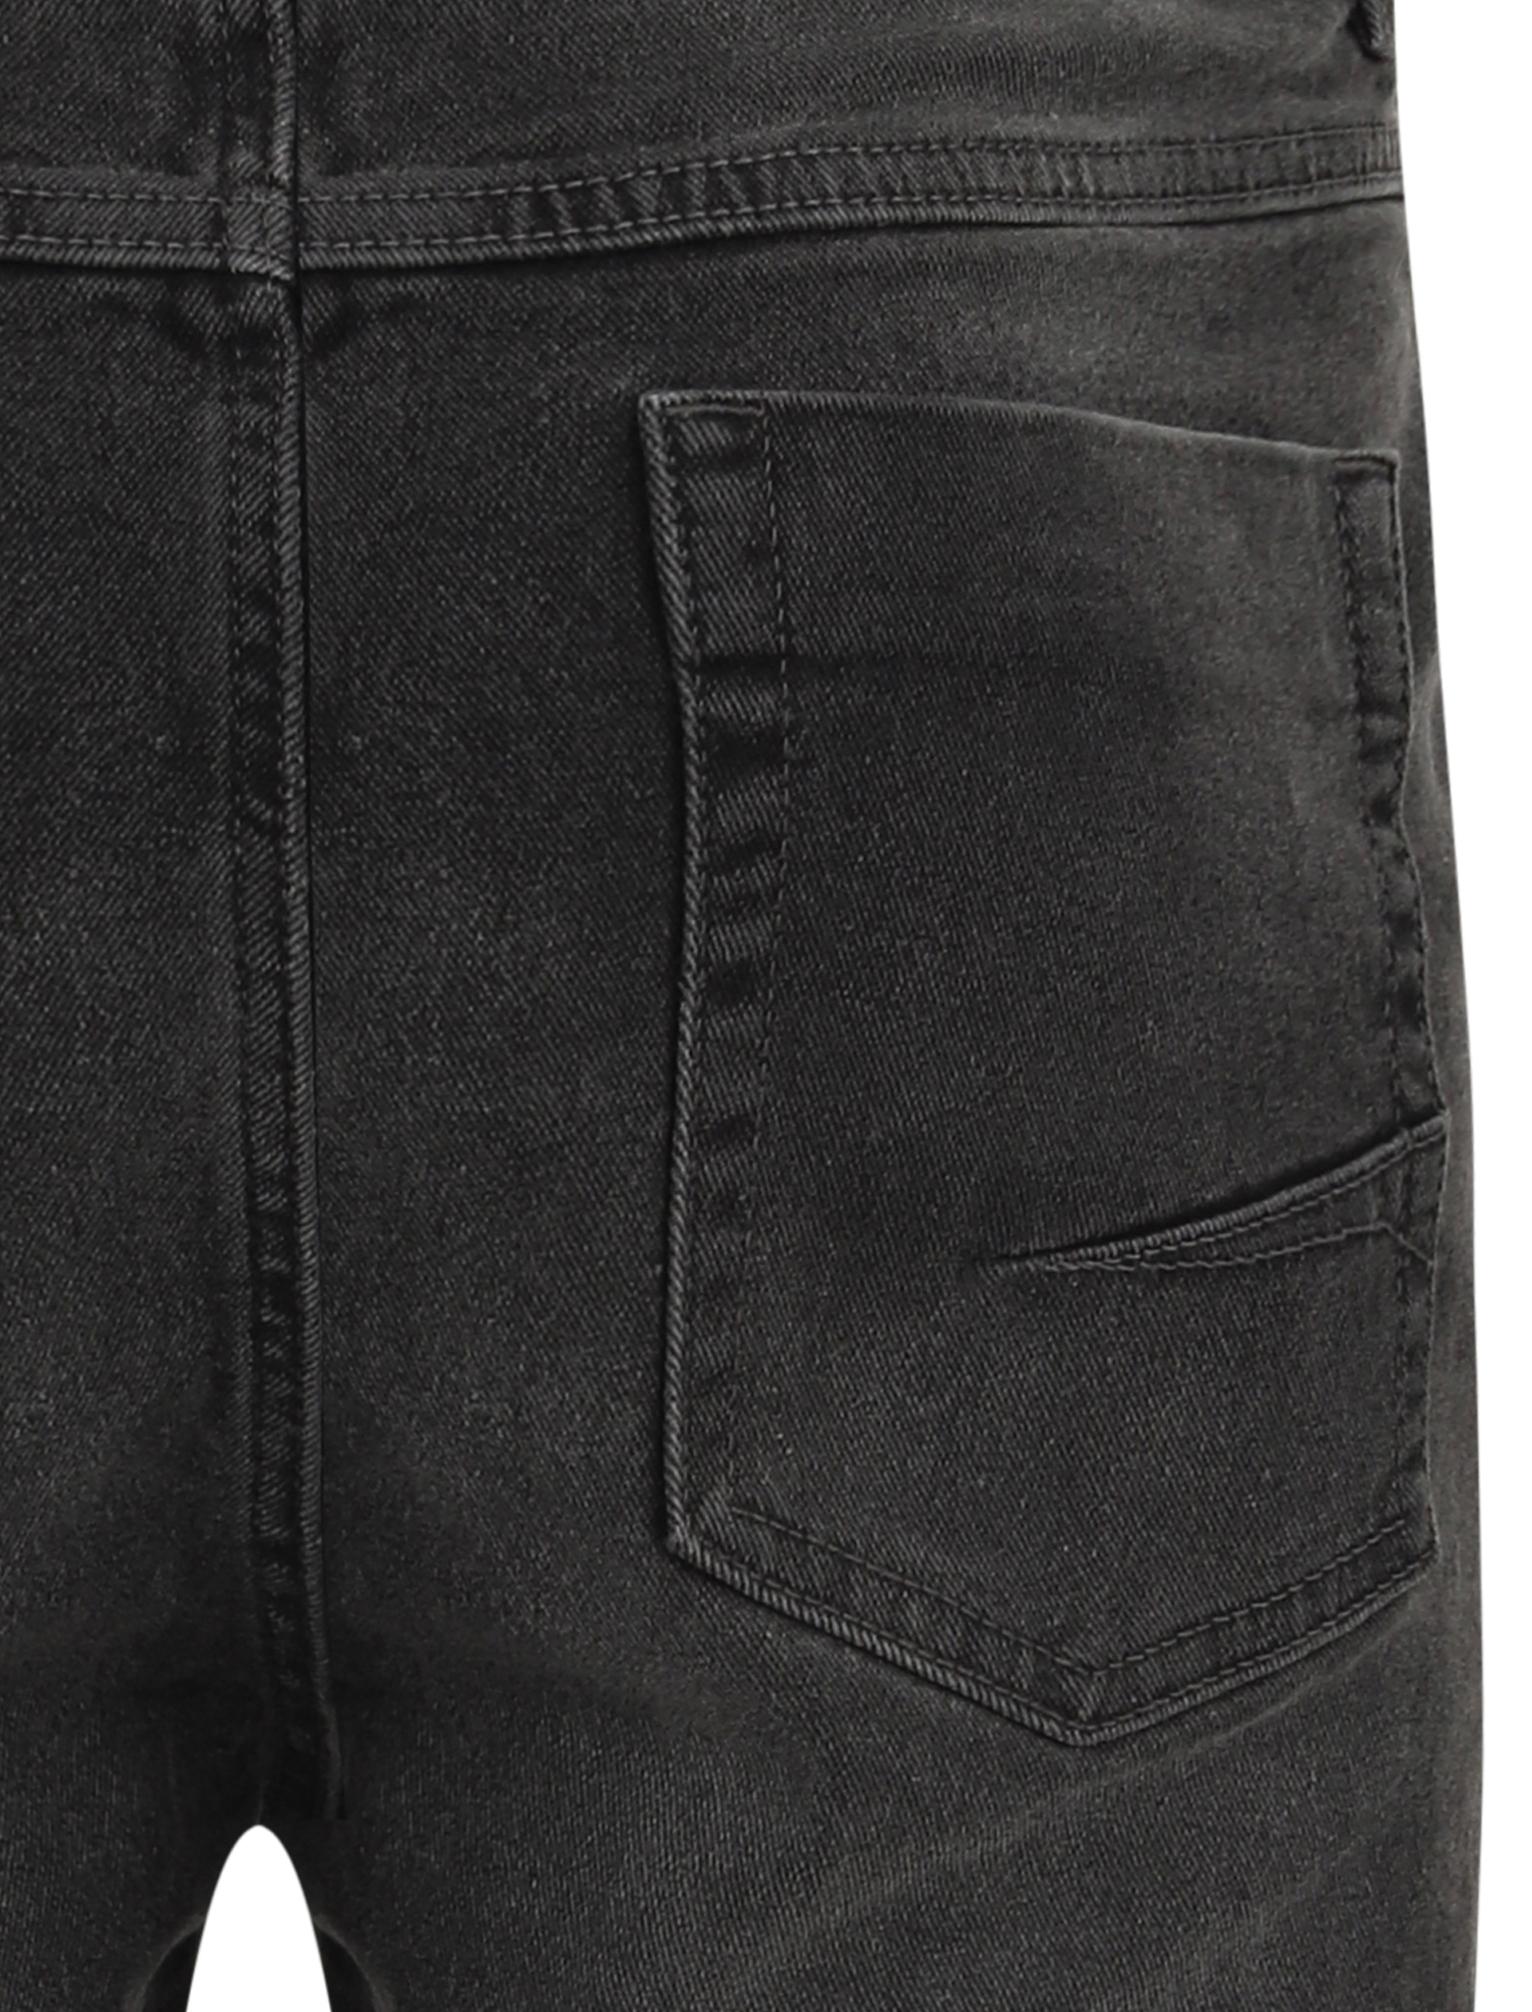 Tokyo-Laundry-Mens-Stretch-Denim-Shorts-Chino-Jean-Vintage-Dark-Light-Wash-Slim thumbnail 9